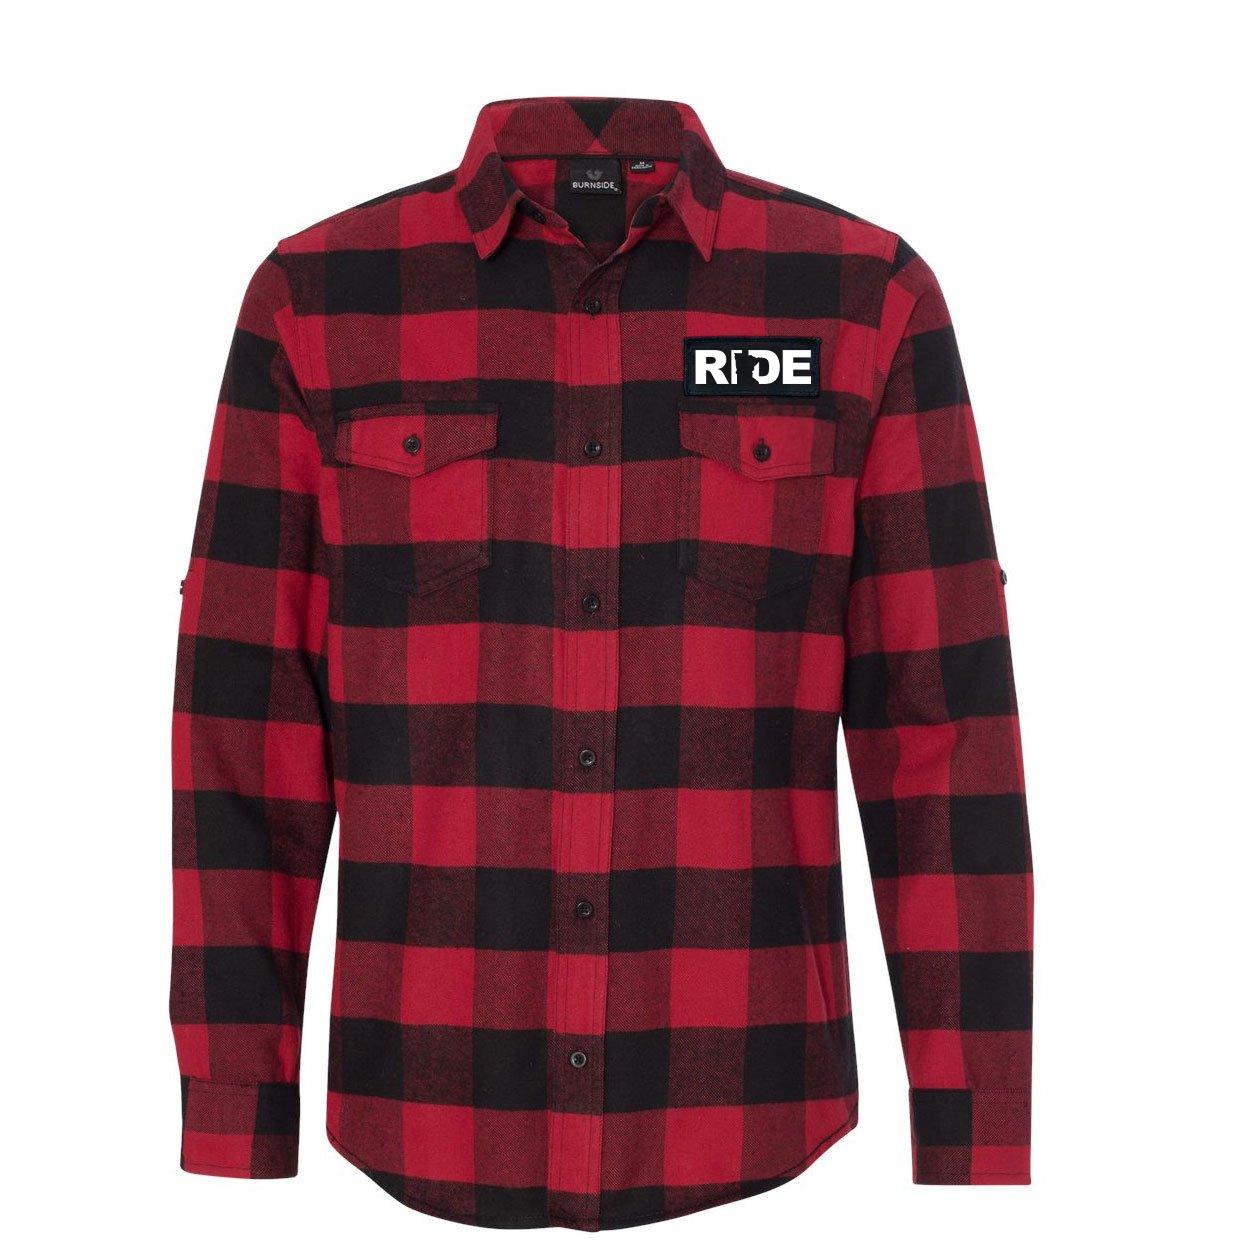 Ride Minnesota Classic Unisex Long Sleeve Woven Patch Flannel Shirt Red/Black Buffalo (White Logo)